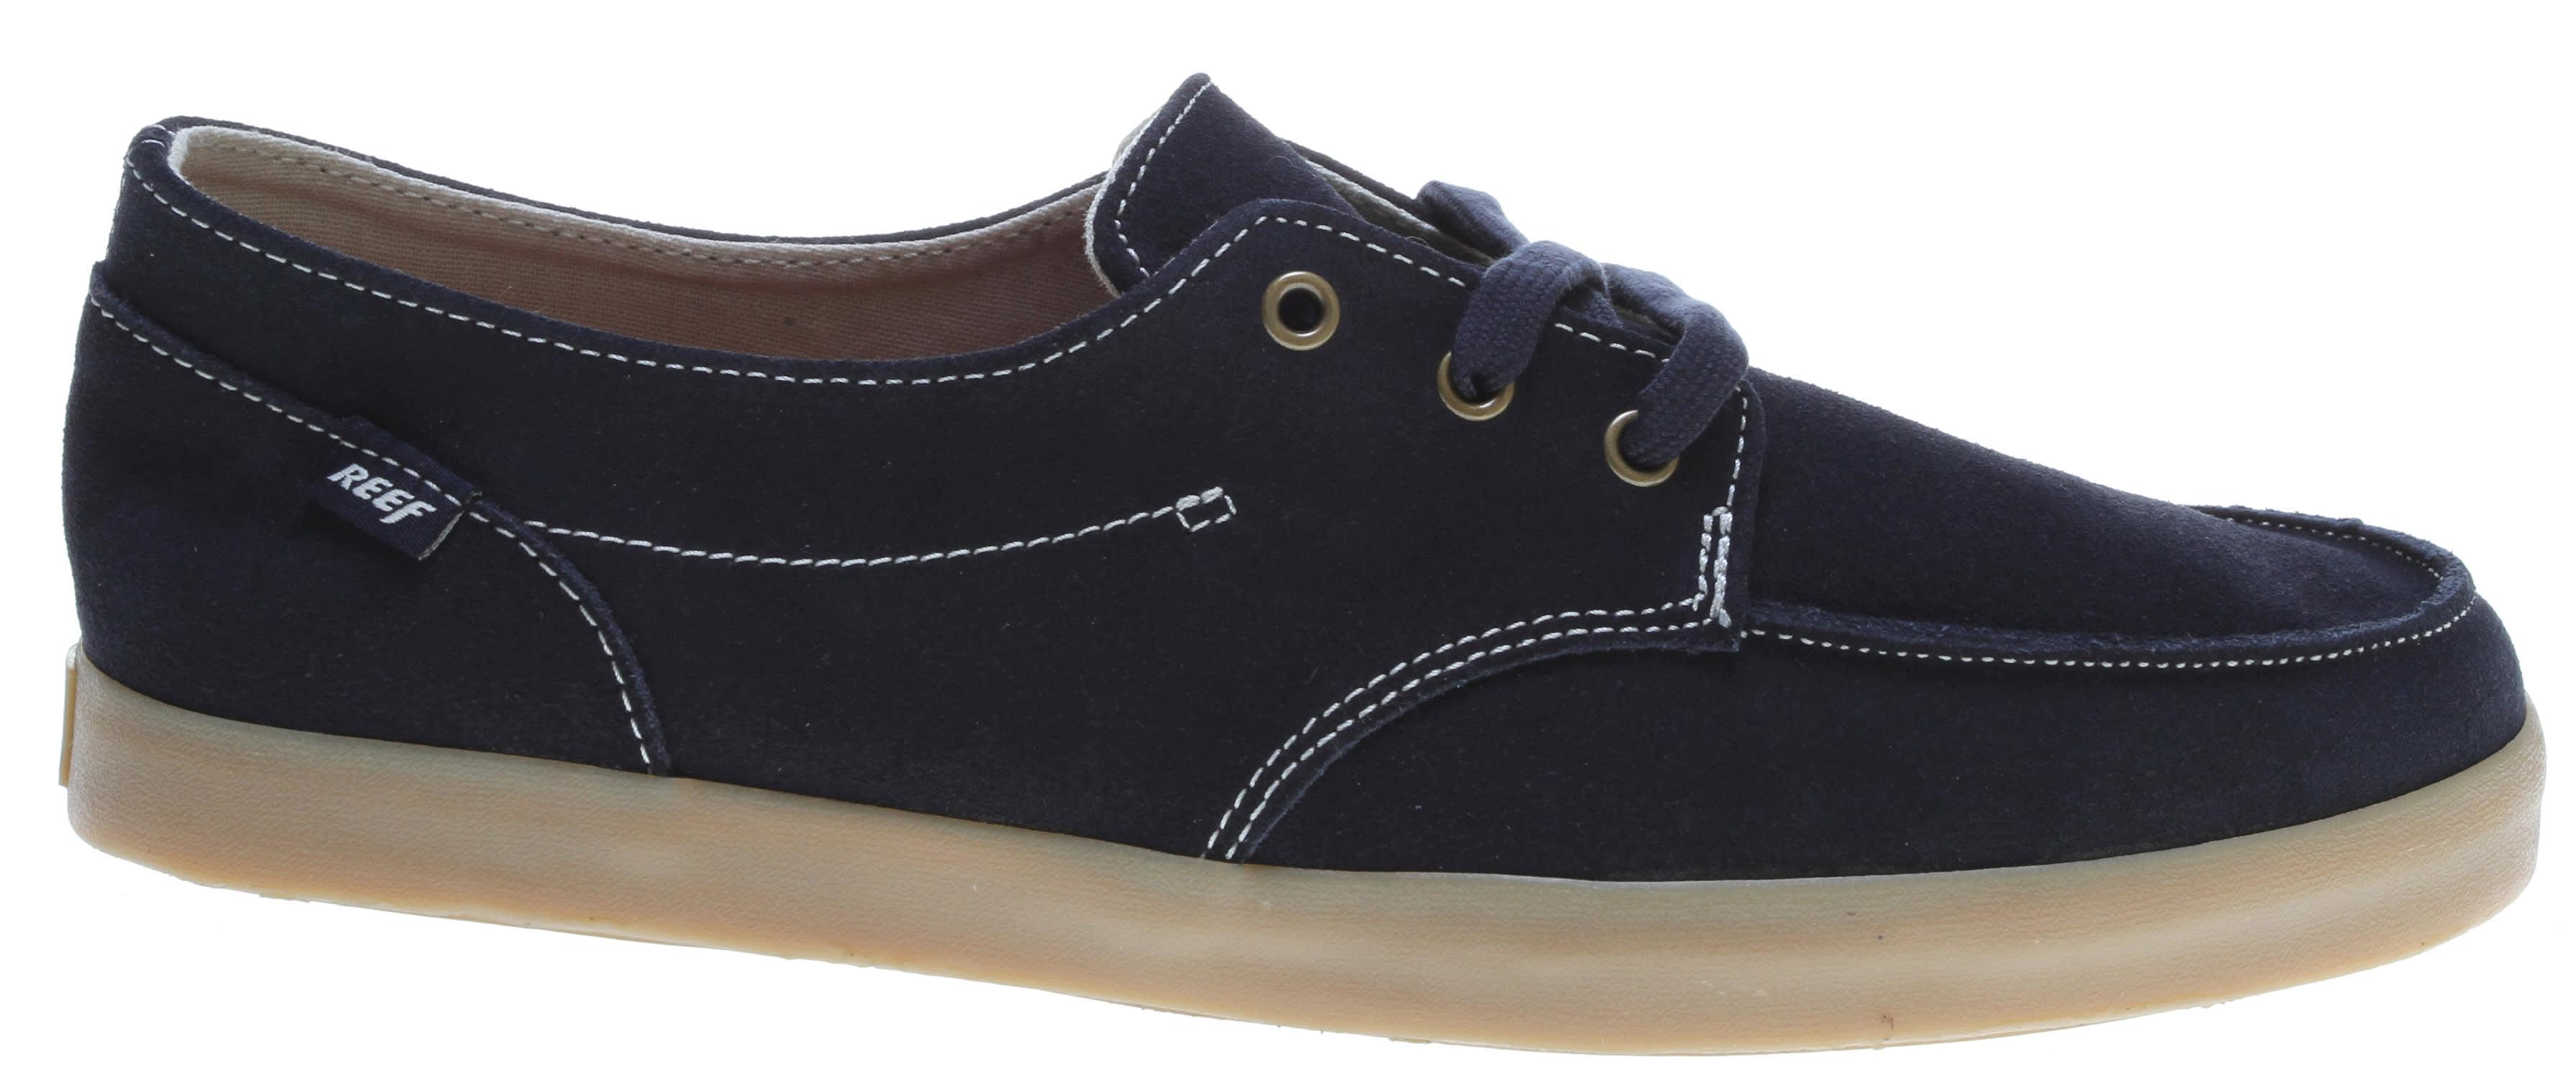 80c9f50afeb4b Reef Deck Hand 2 LE Shoes - thumbnail 1